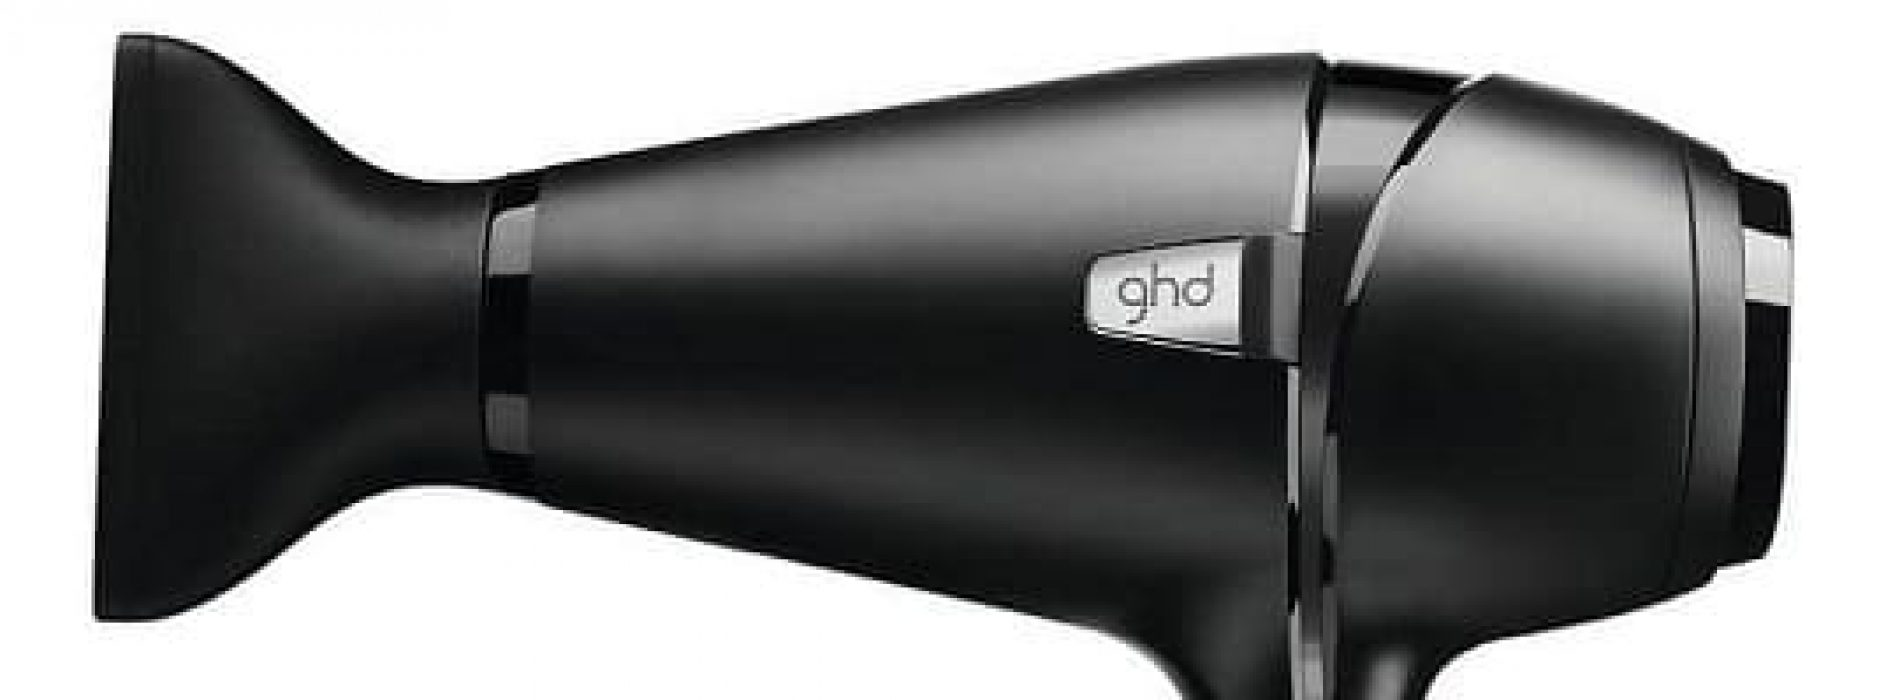 GHD Air Professional hårføner